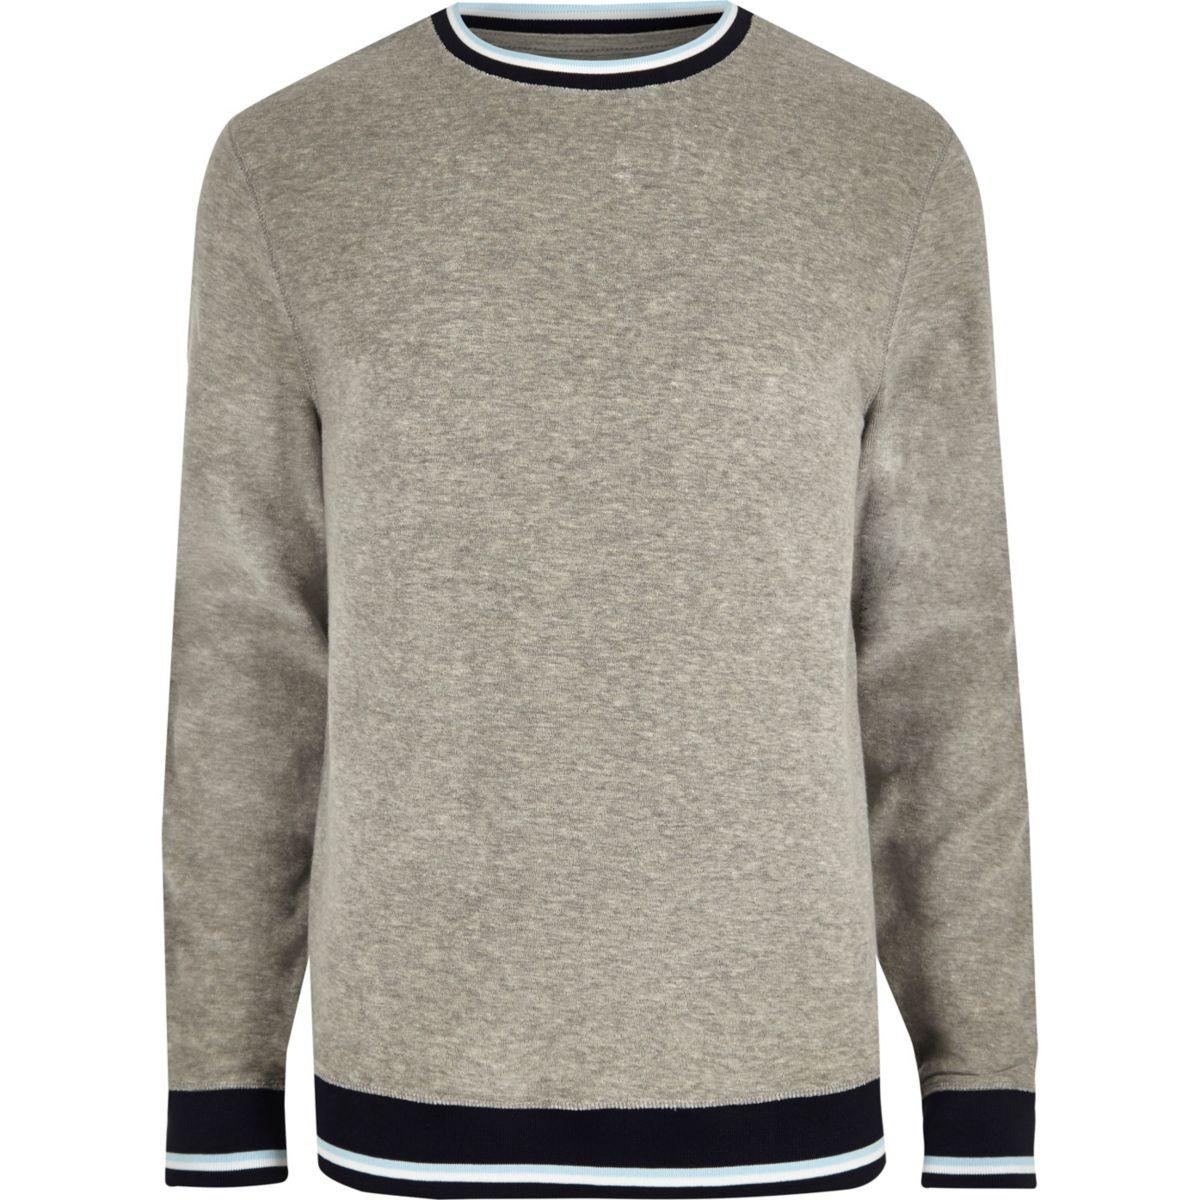 Grey tipped towel sweatshirt